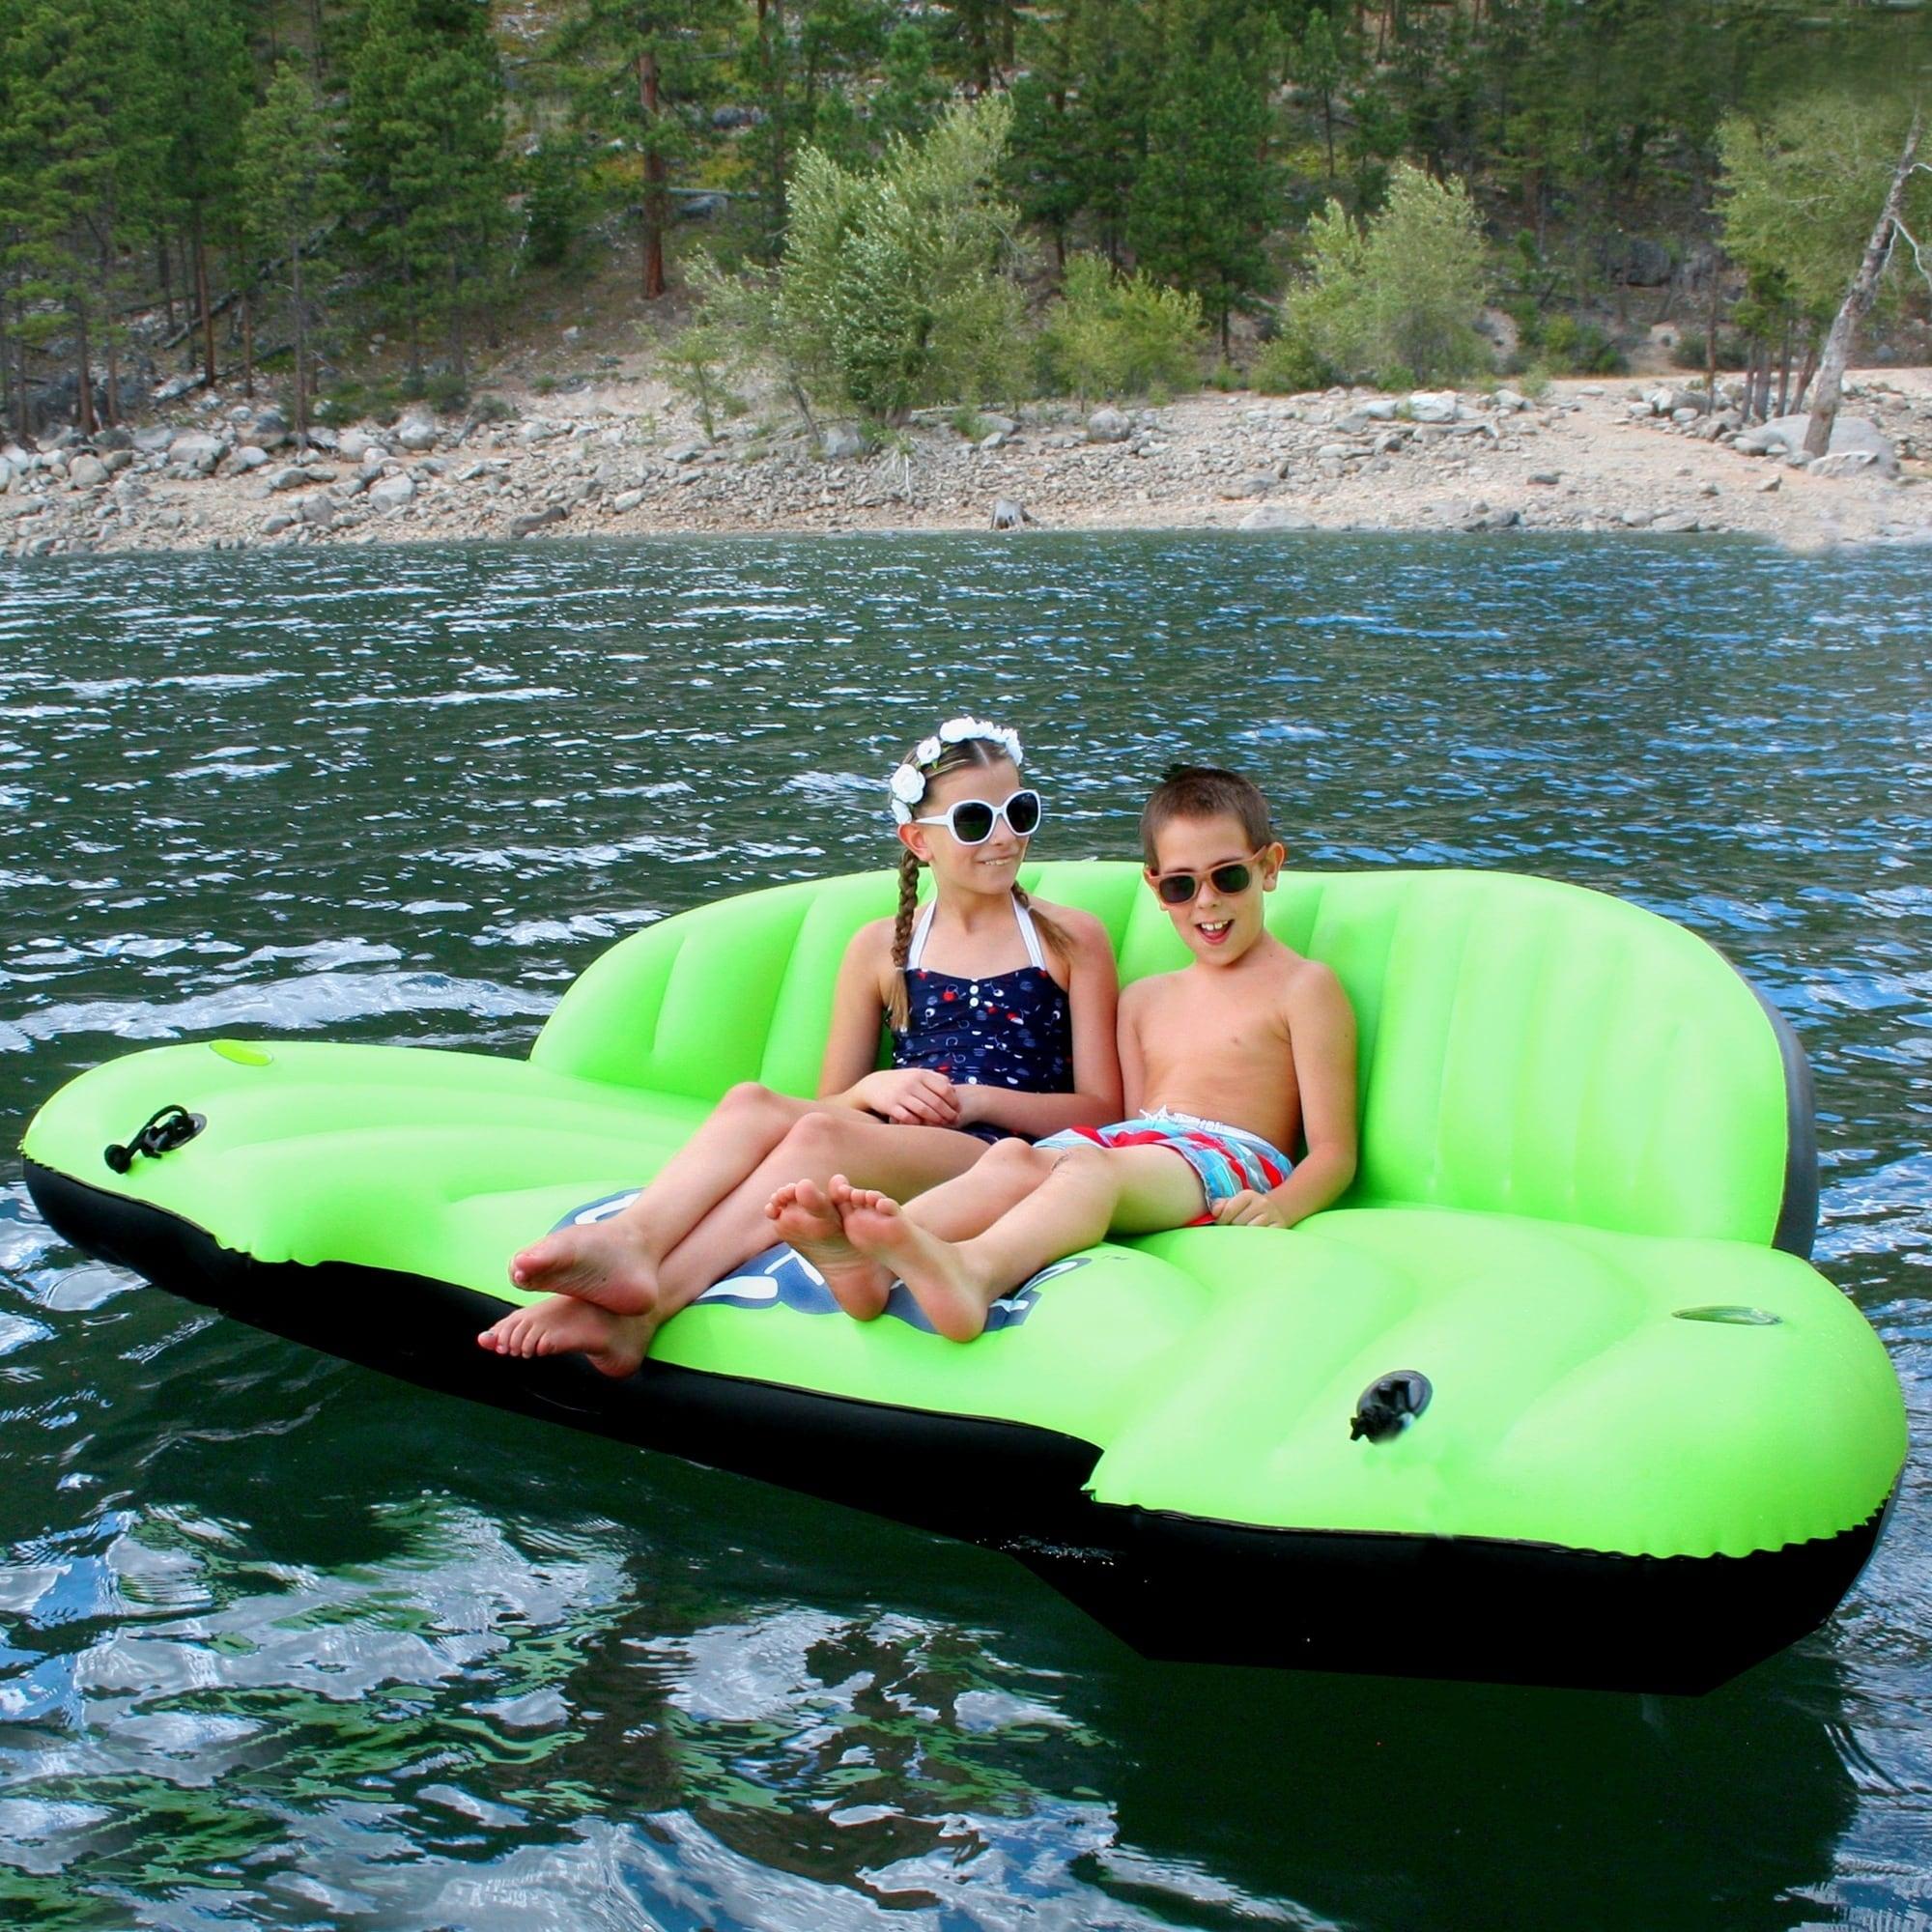 Lay-Z-River Inflatable Sofa (Lay-Z-River Sofa), Blue island